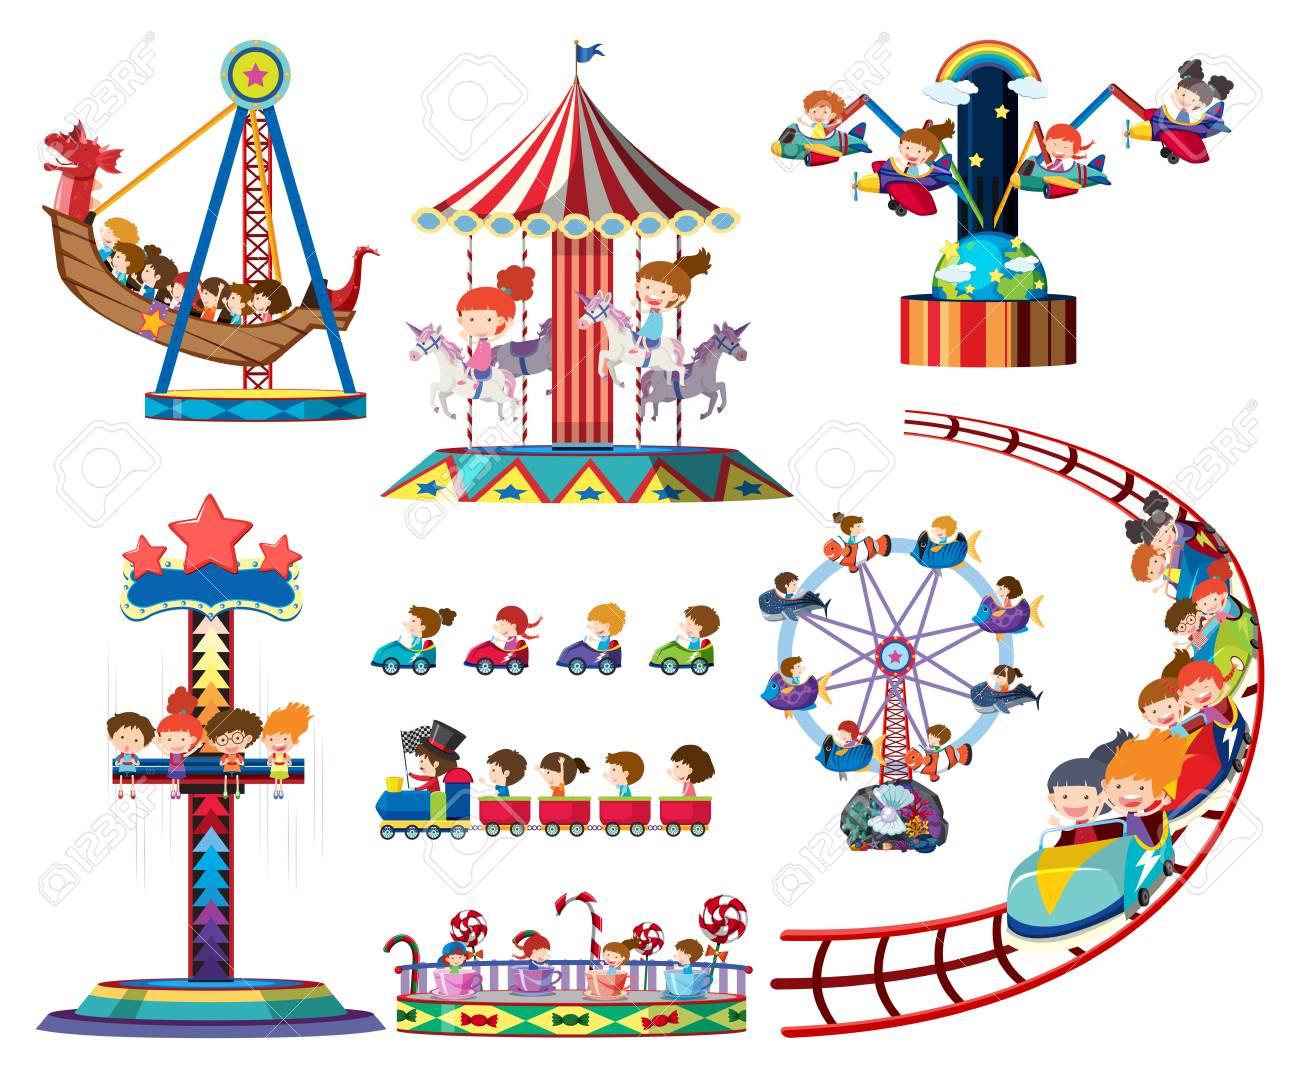 A set of theme park rides illustration - 105614438